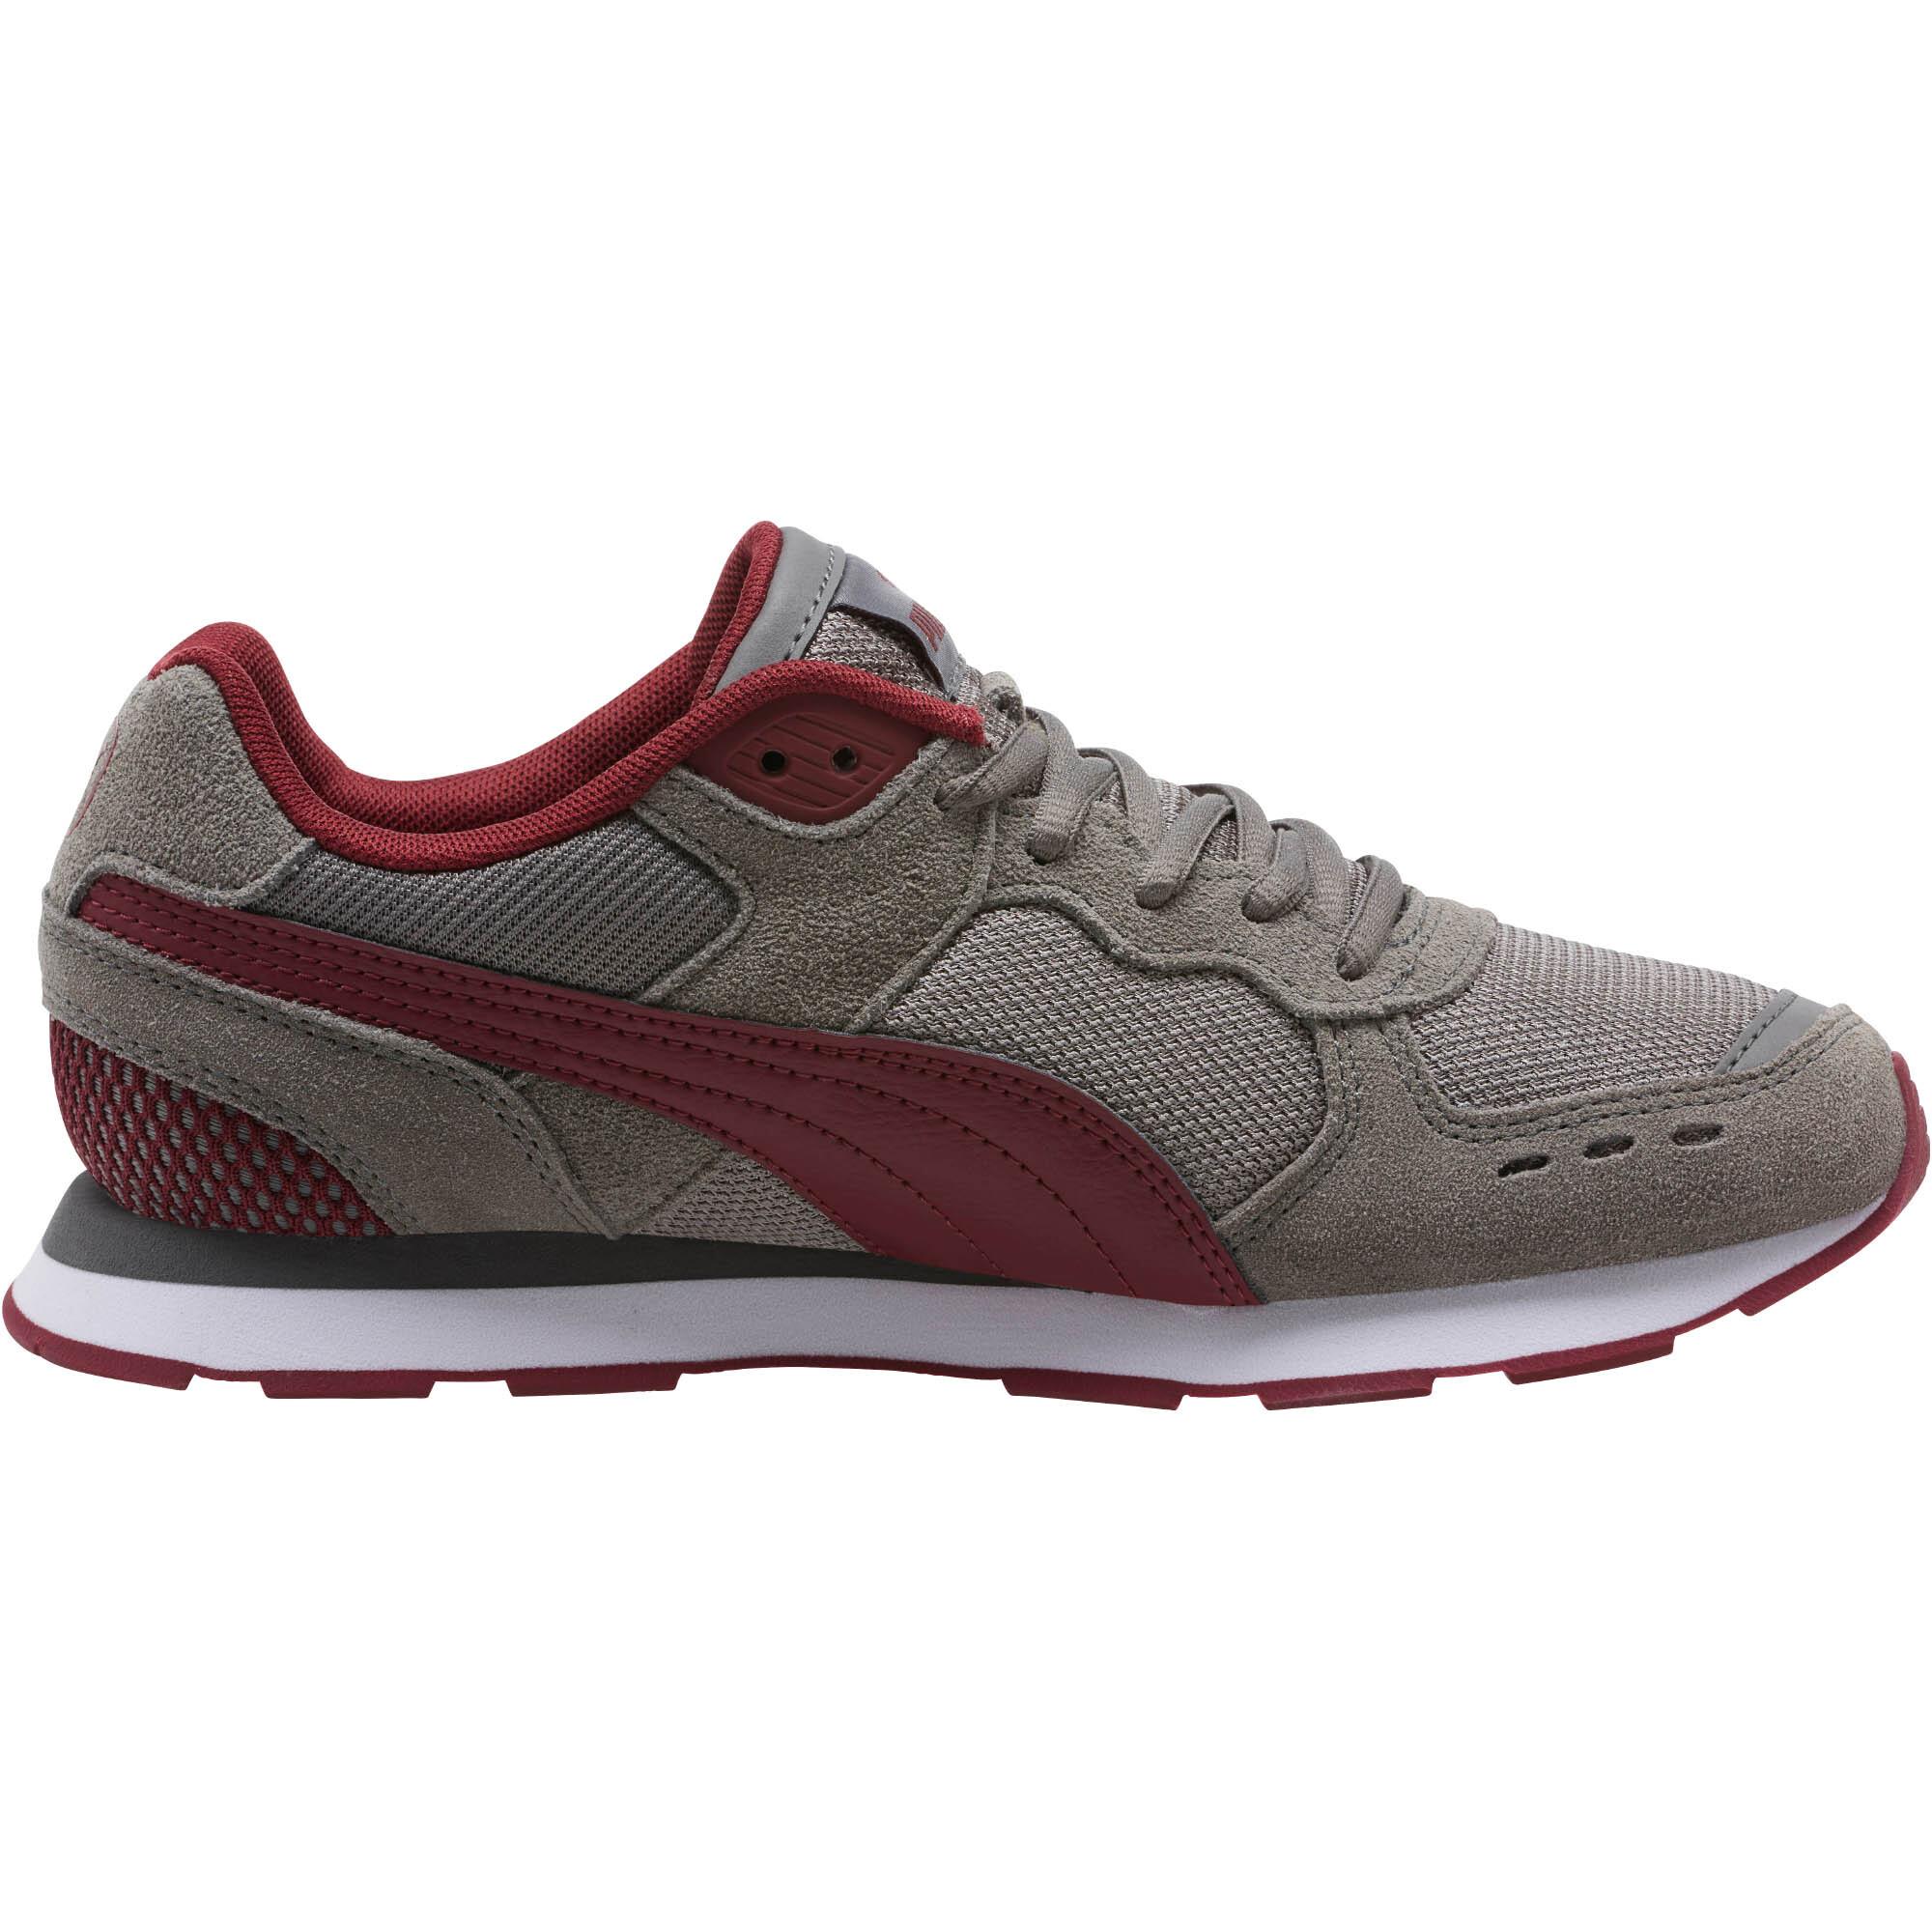 PUMA-Vista-Women-s-Sneakers-Women-Shoe-Basics thumbnail 21